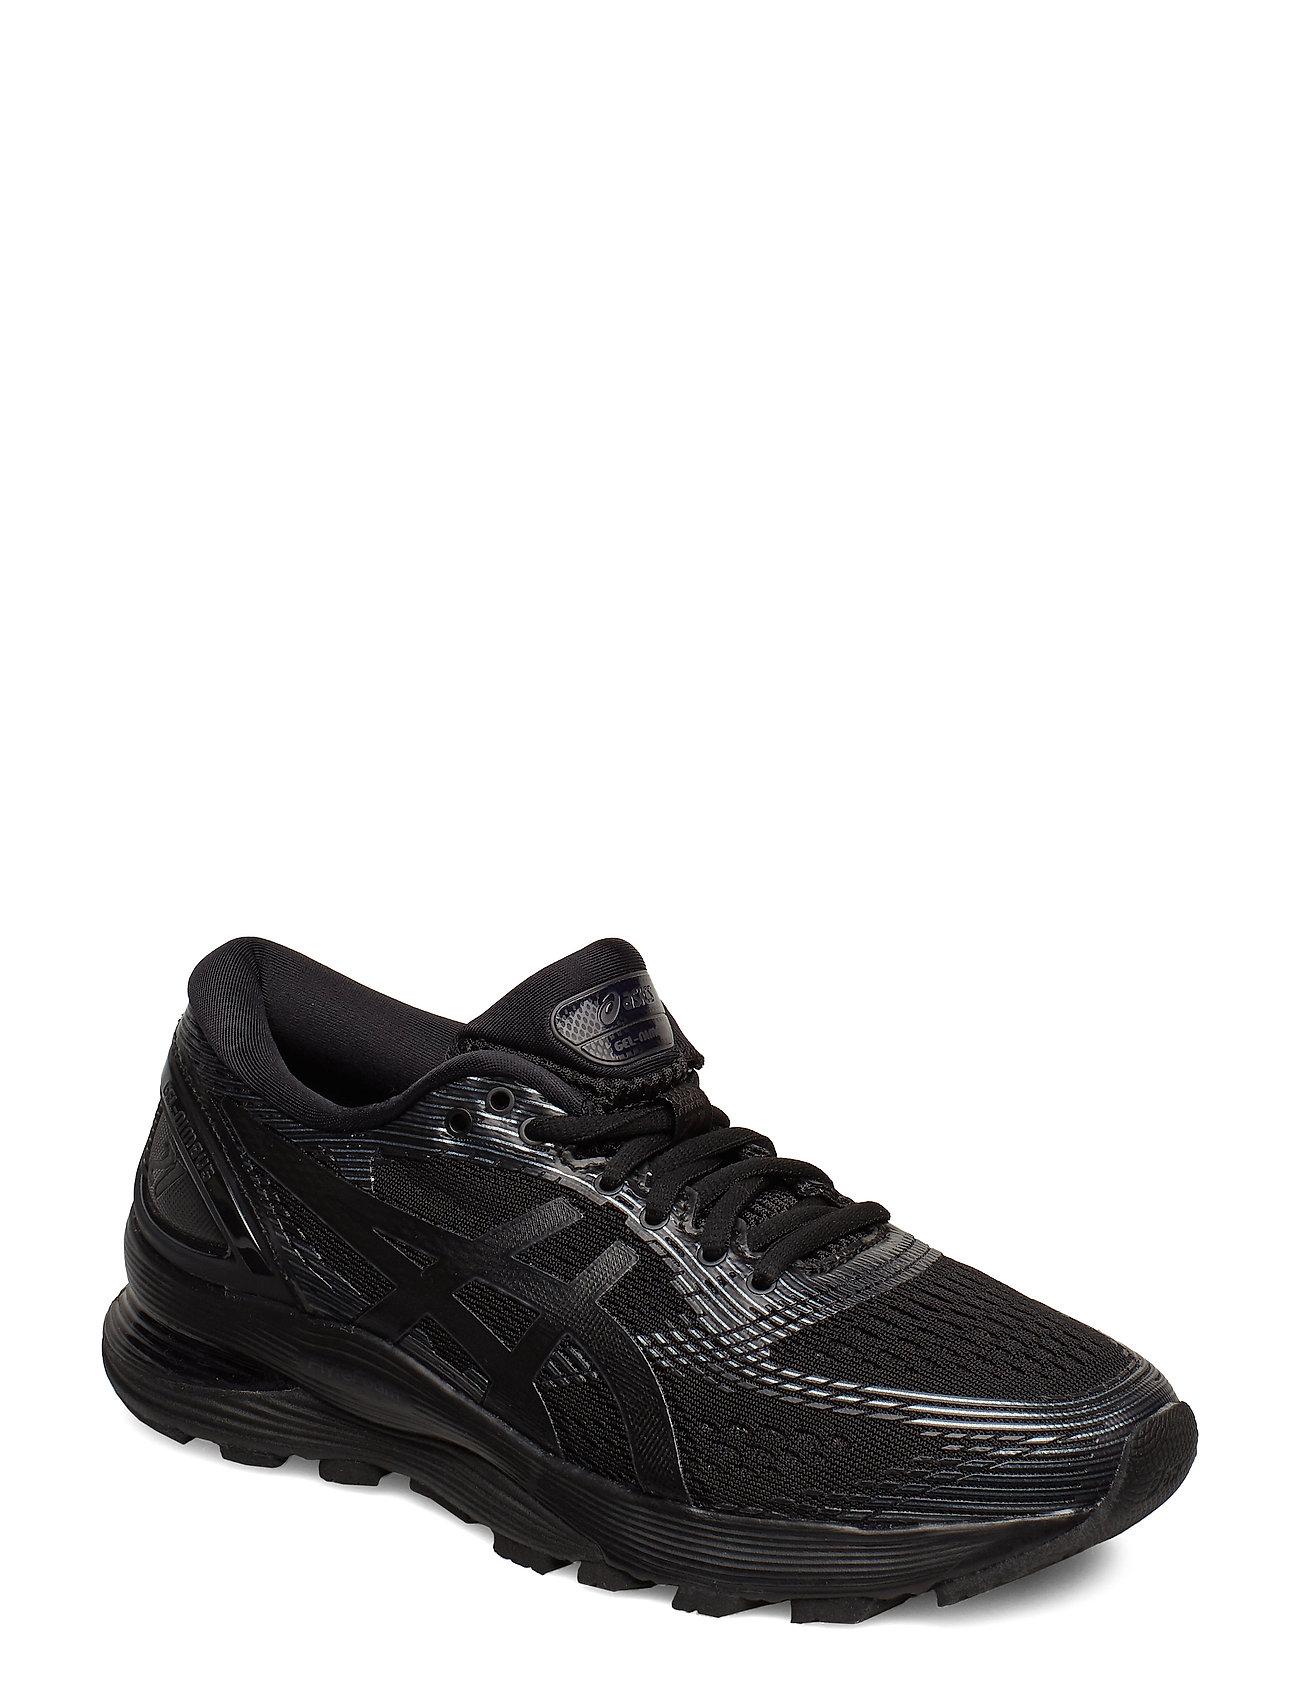 ASICS Gel-Nimbus 21 Shoes Sport Shoes Running Shoes Schwarz ASICS